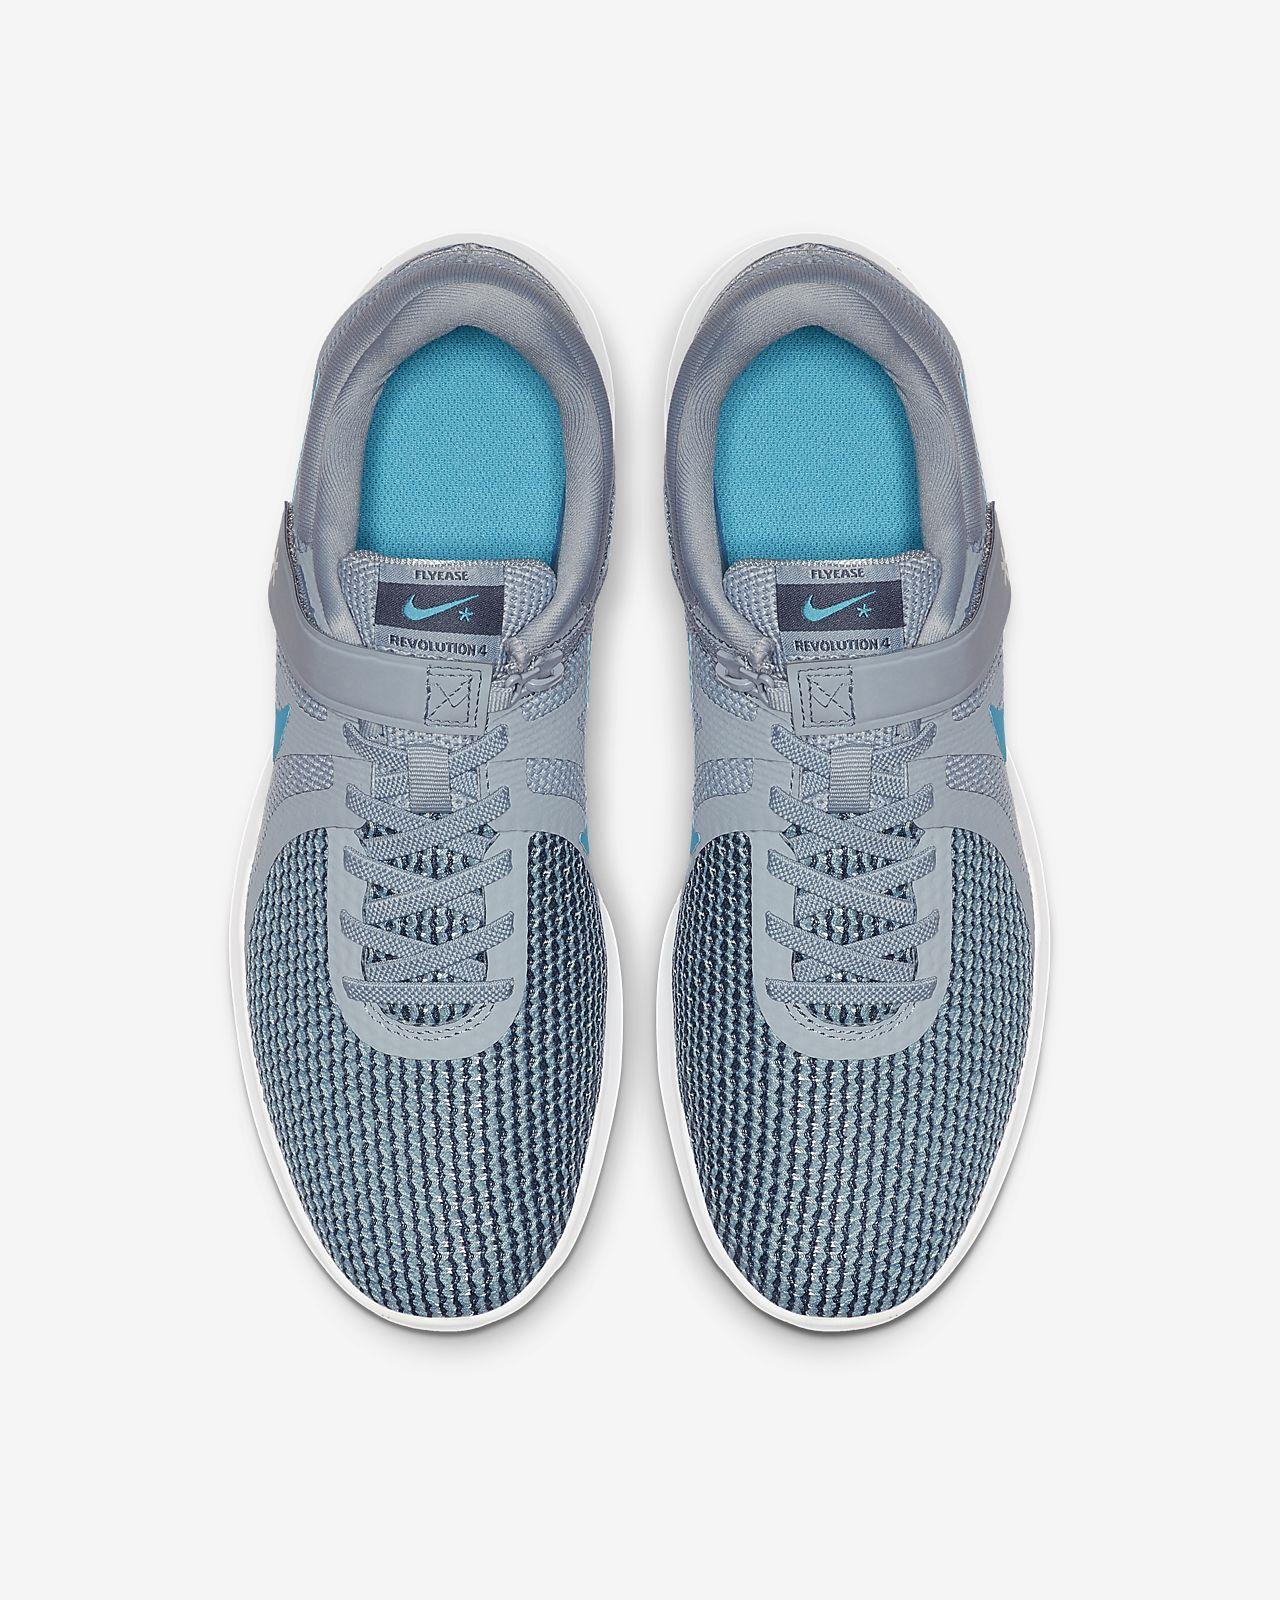 40d2b9686642b Nike Revolution 4 FlyEase Men s Running Shoe. Nike.com AU